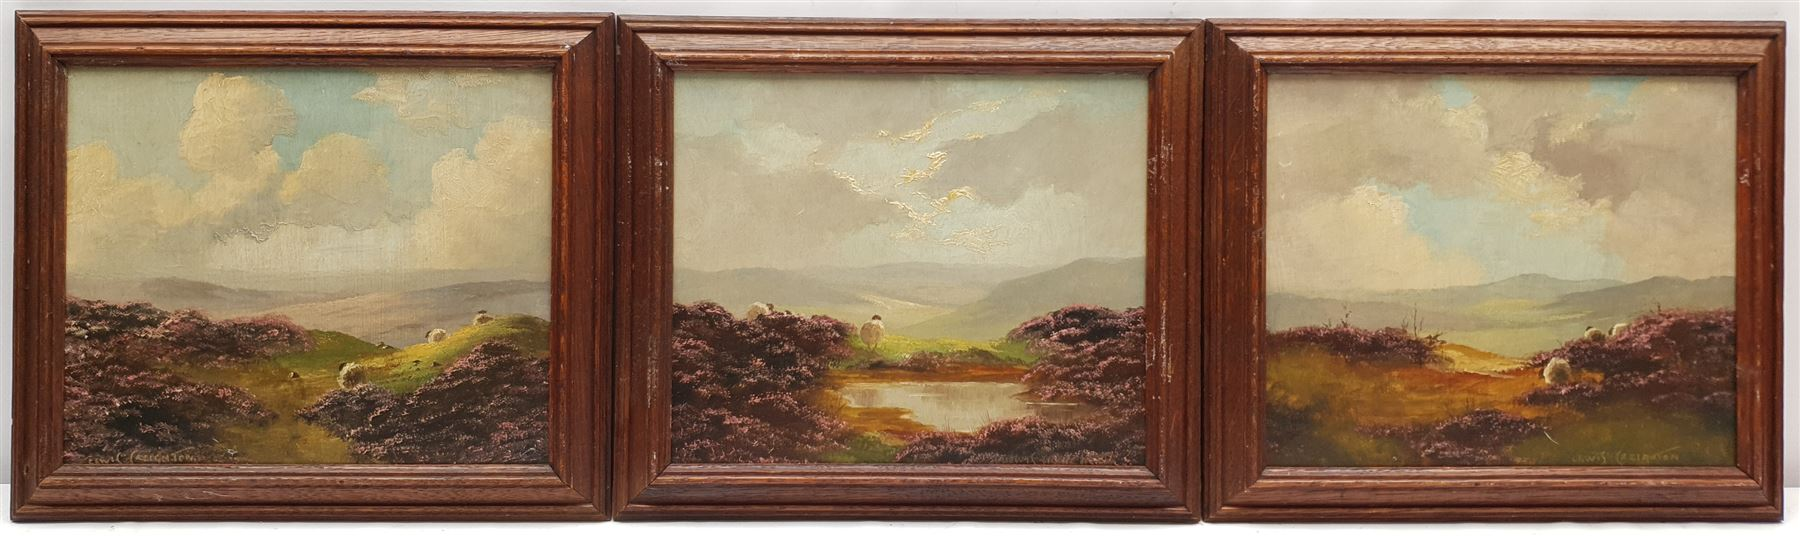 Lewis Creighton (British 1918-1996): Sheep on Heather Moorland